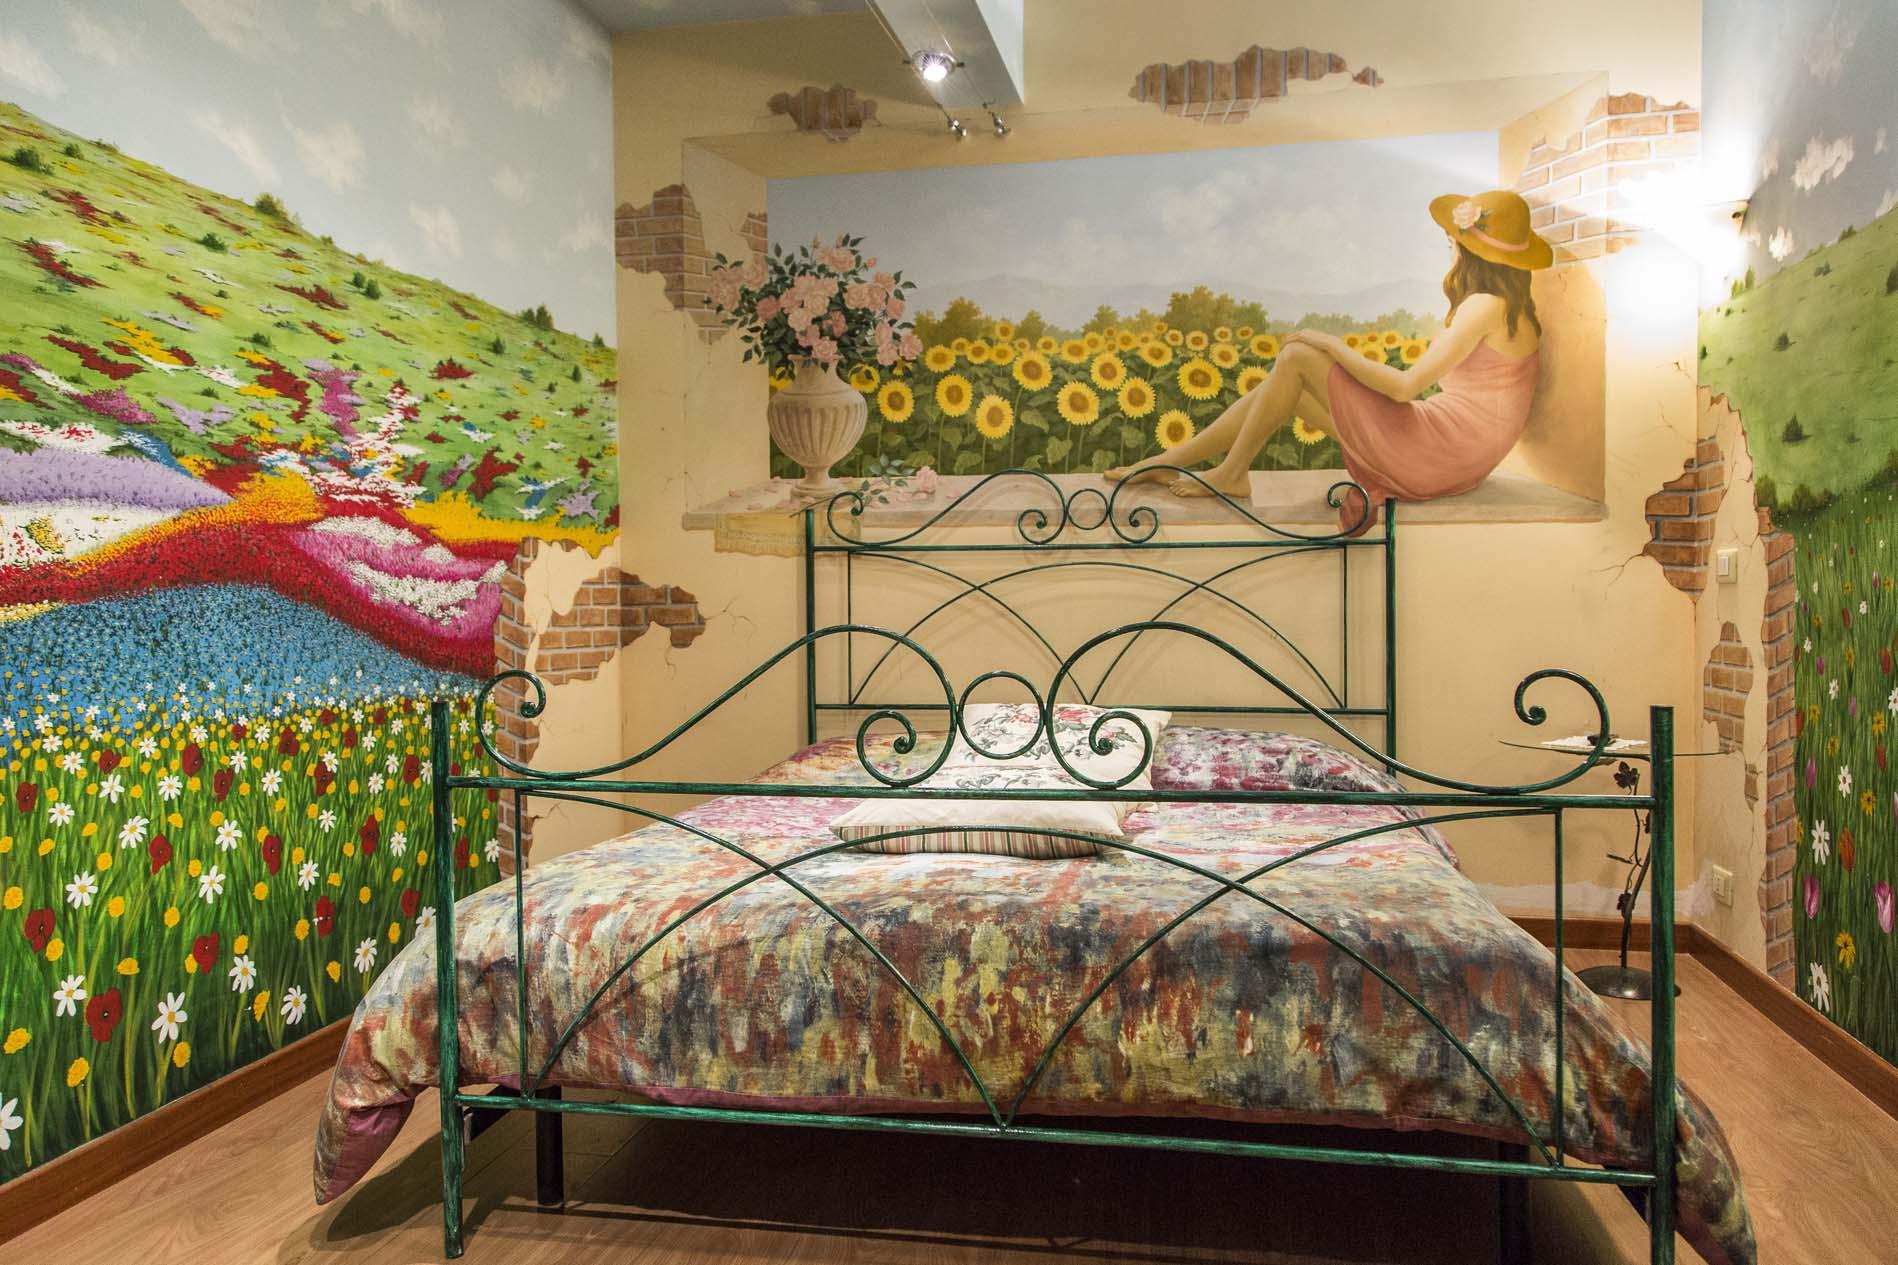 girasoli- Bed & Breakfast a Tivoli